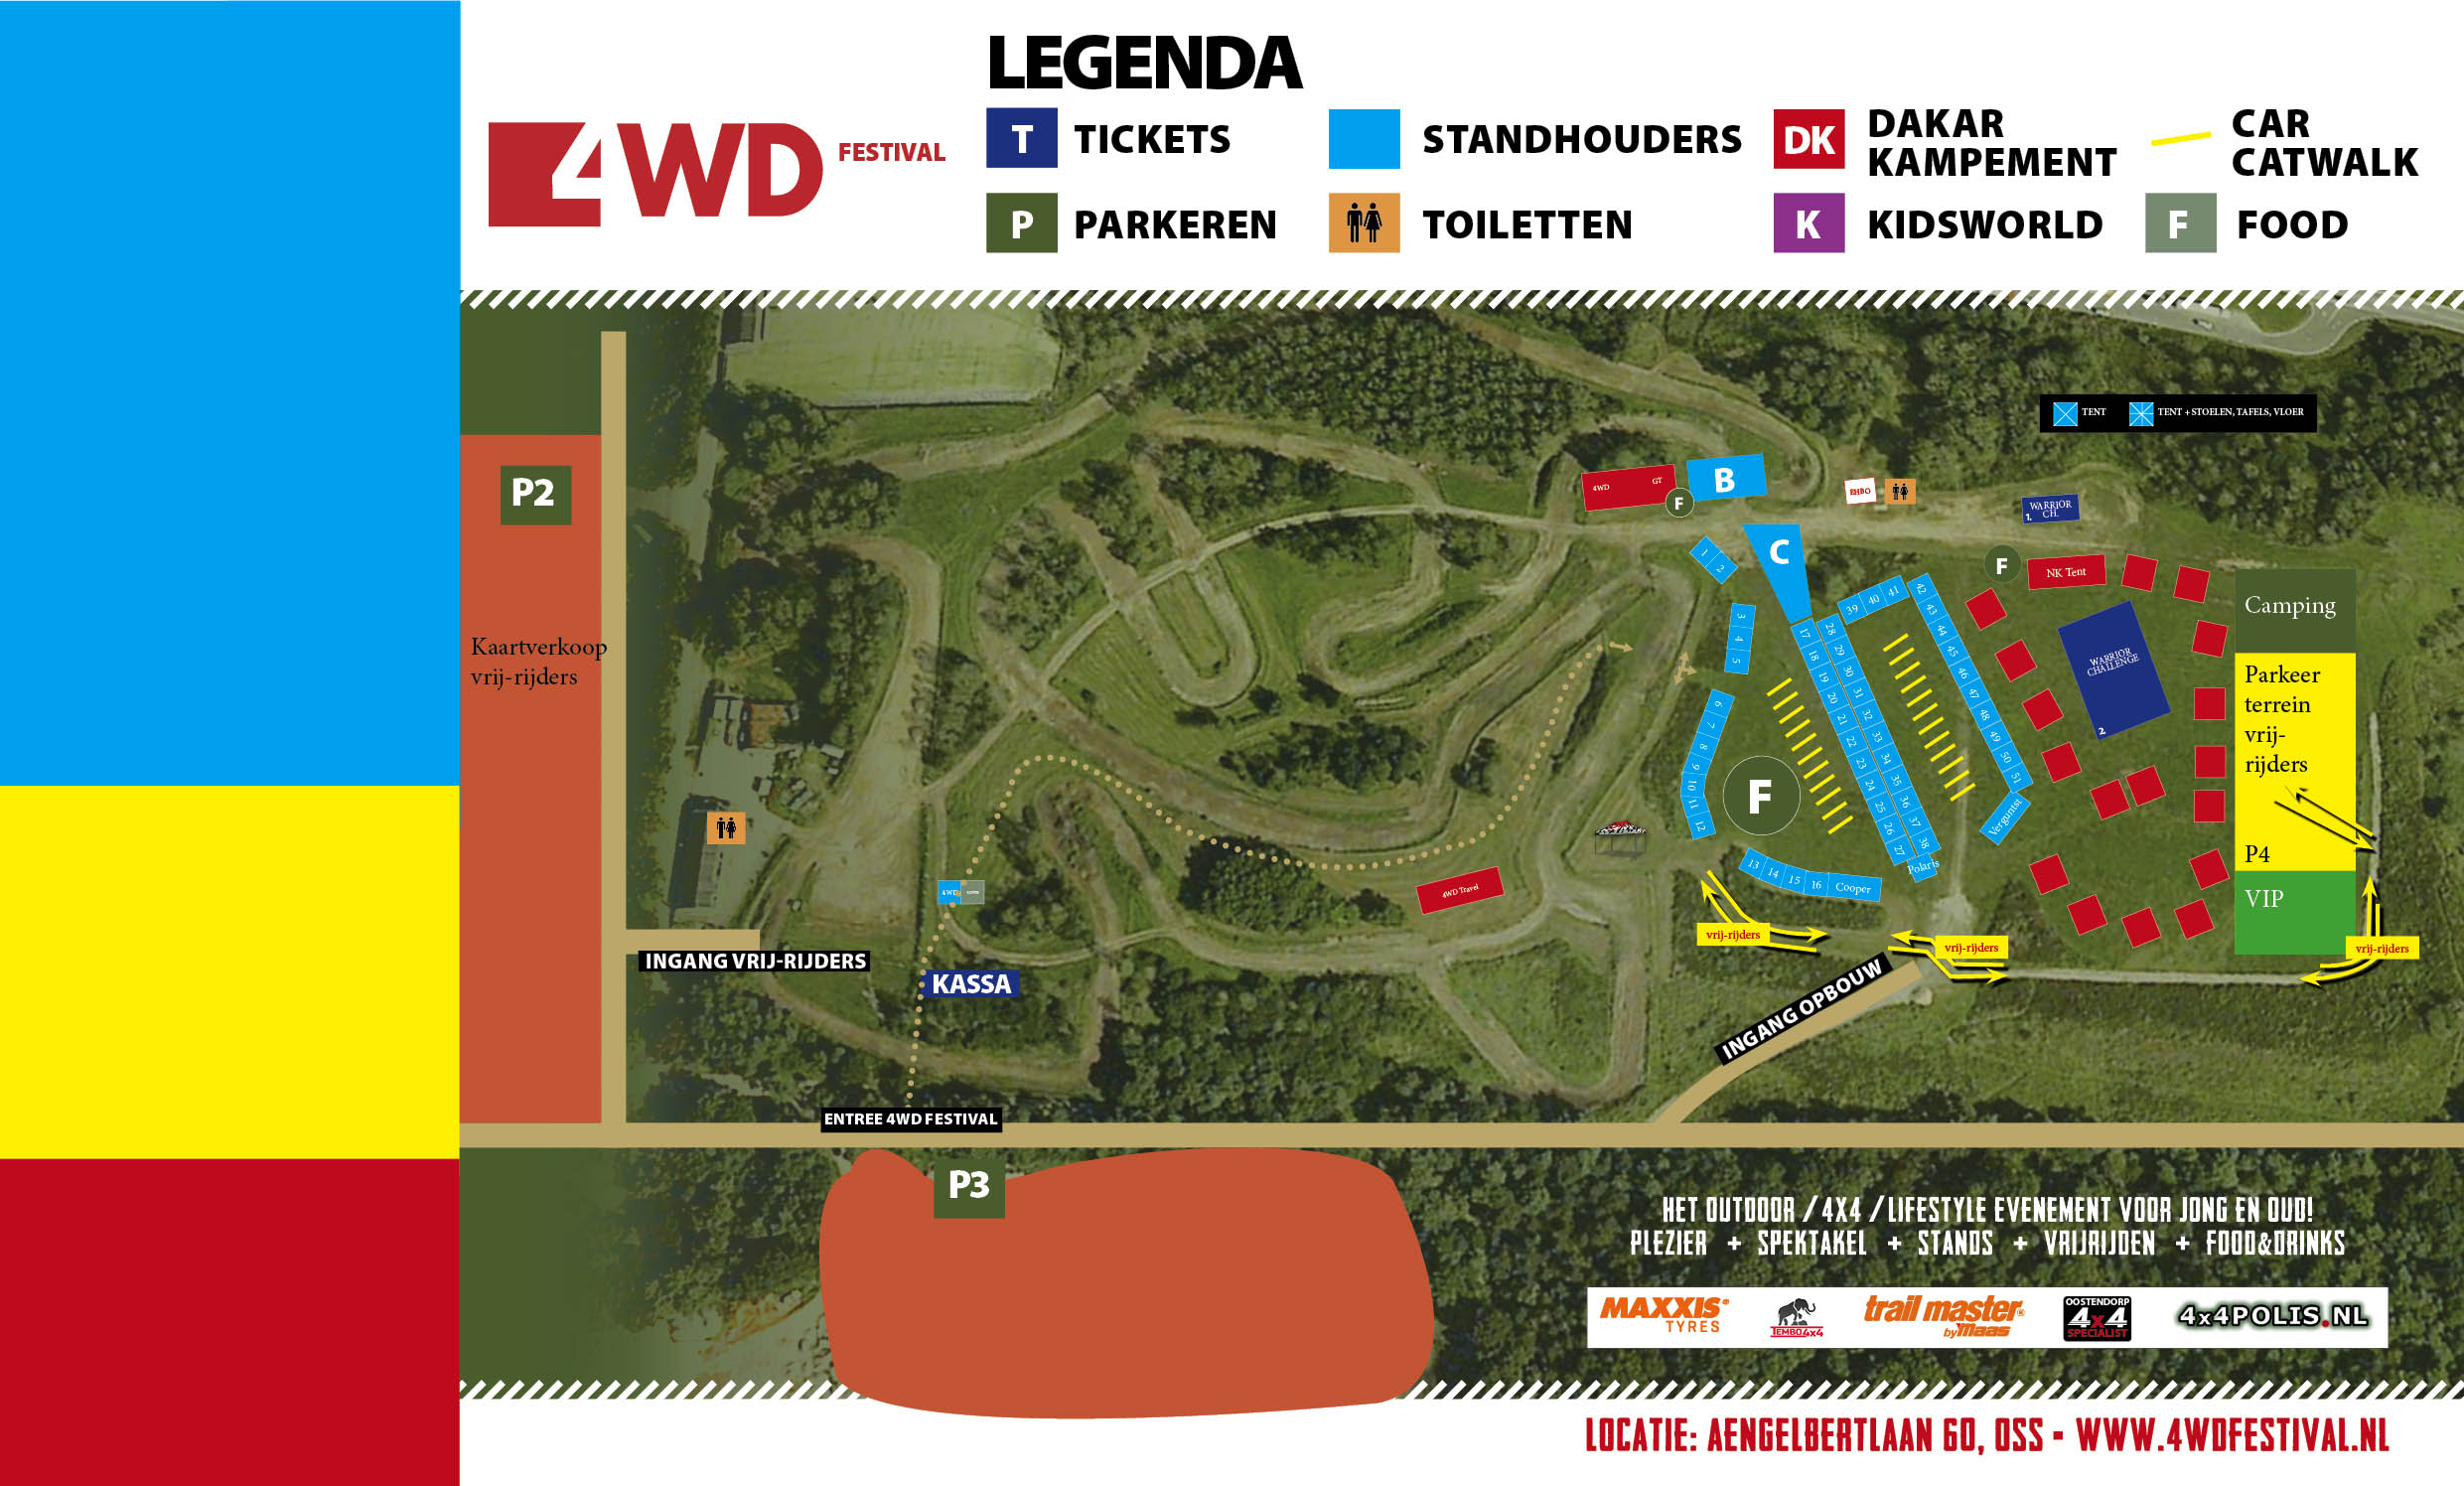 4WD Festival plattegrond